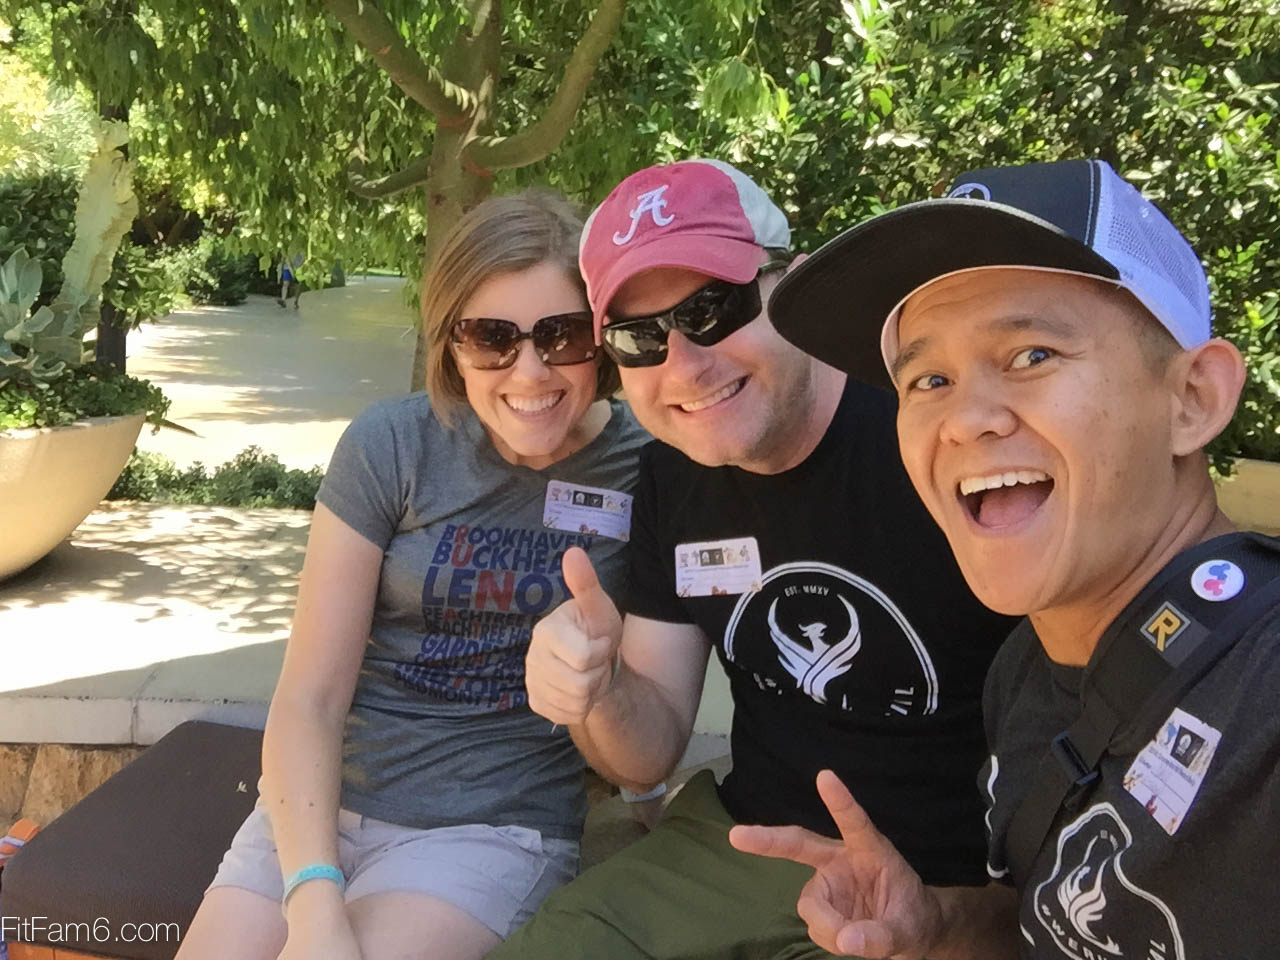 It's AMAZING to meet running friends IRL!  @allenwhittaker  and  @rachelewhittaker